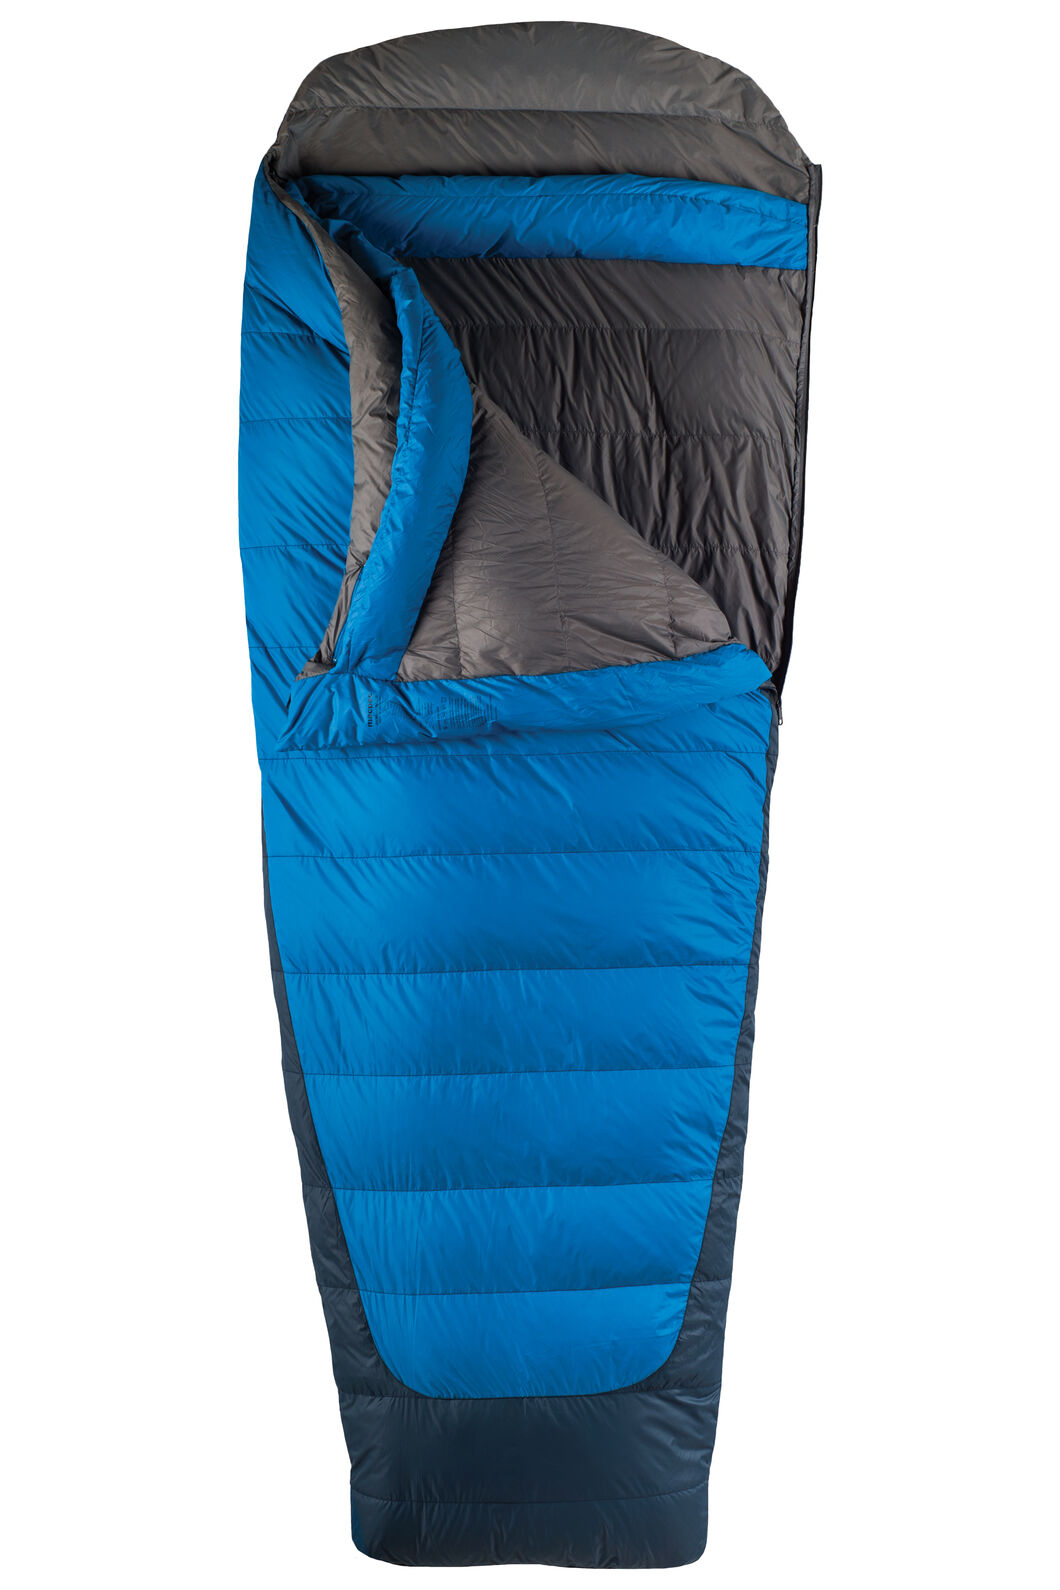 Macpac Escapade 700 Standard Down Sleeping Bag, Classic Blue, hi-res